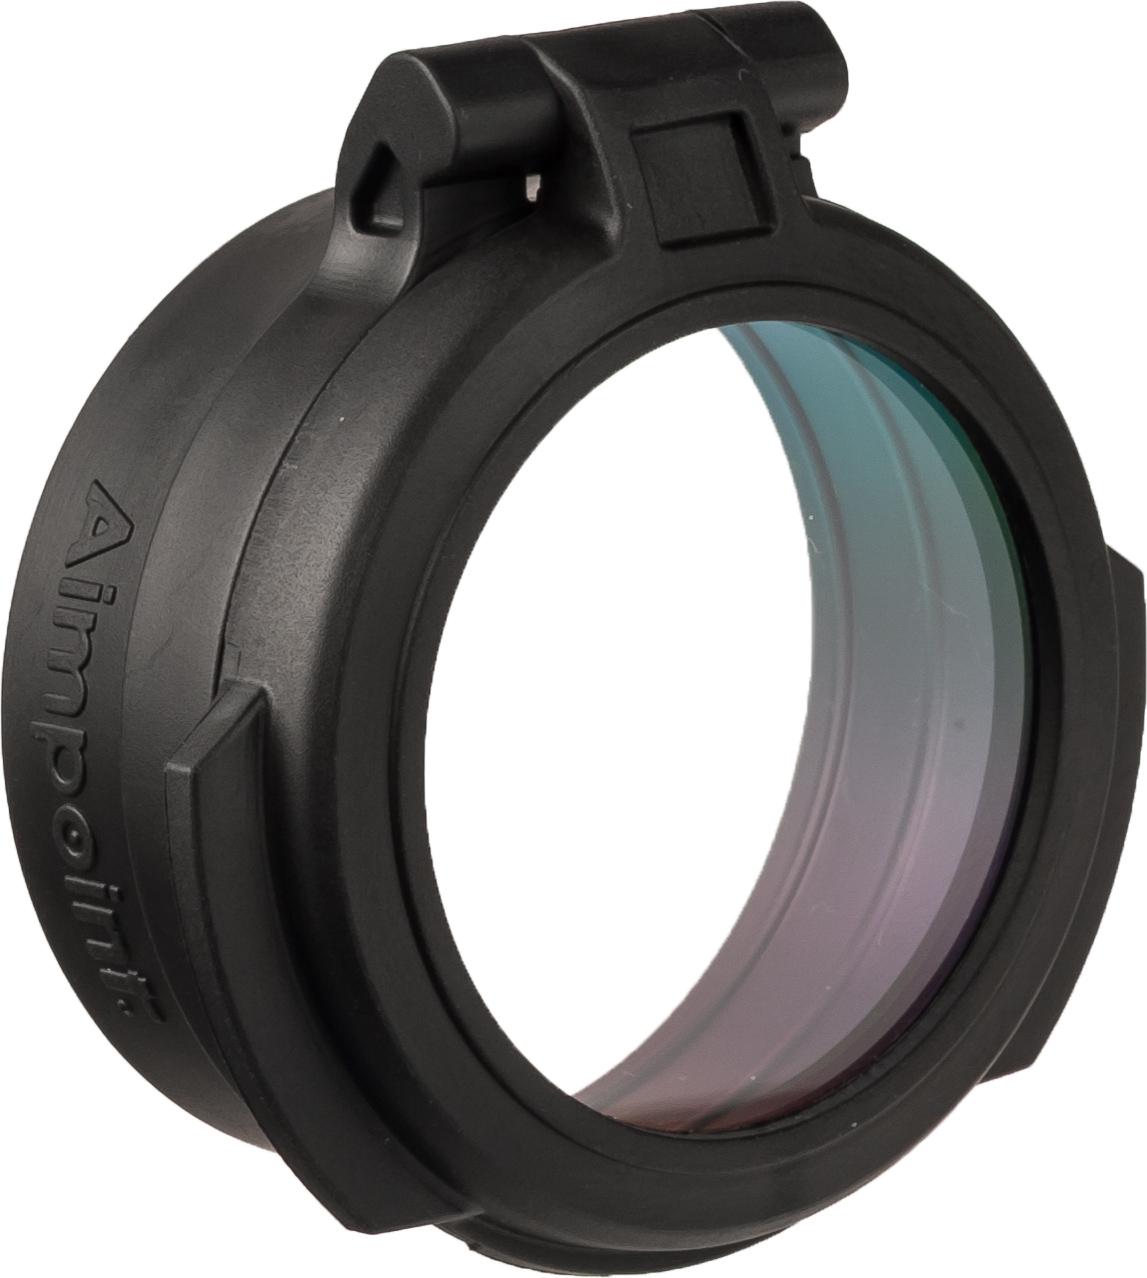 Aimpoint Lenscover Flip-up Rear Transparent 12240